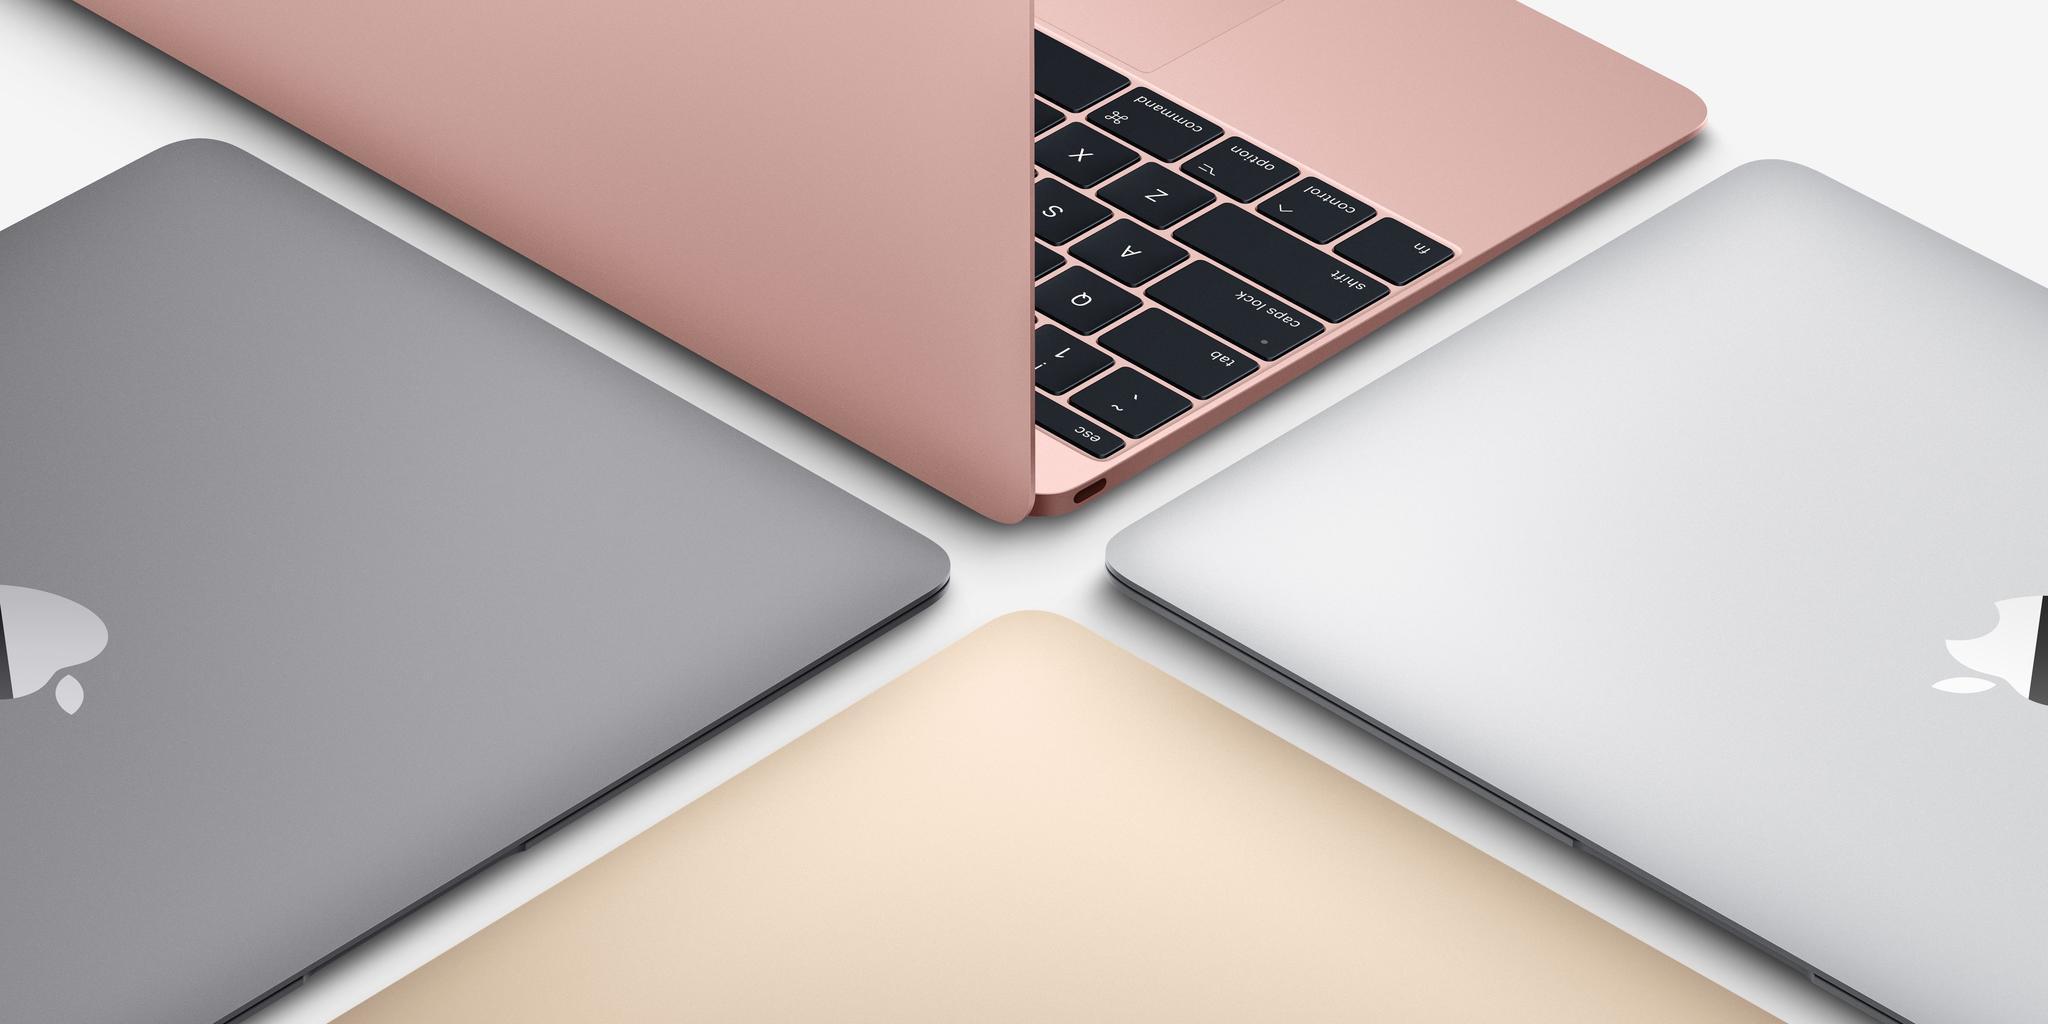 Macbook Air 13 inch kleuren